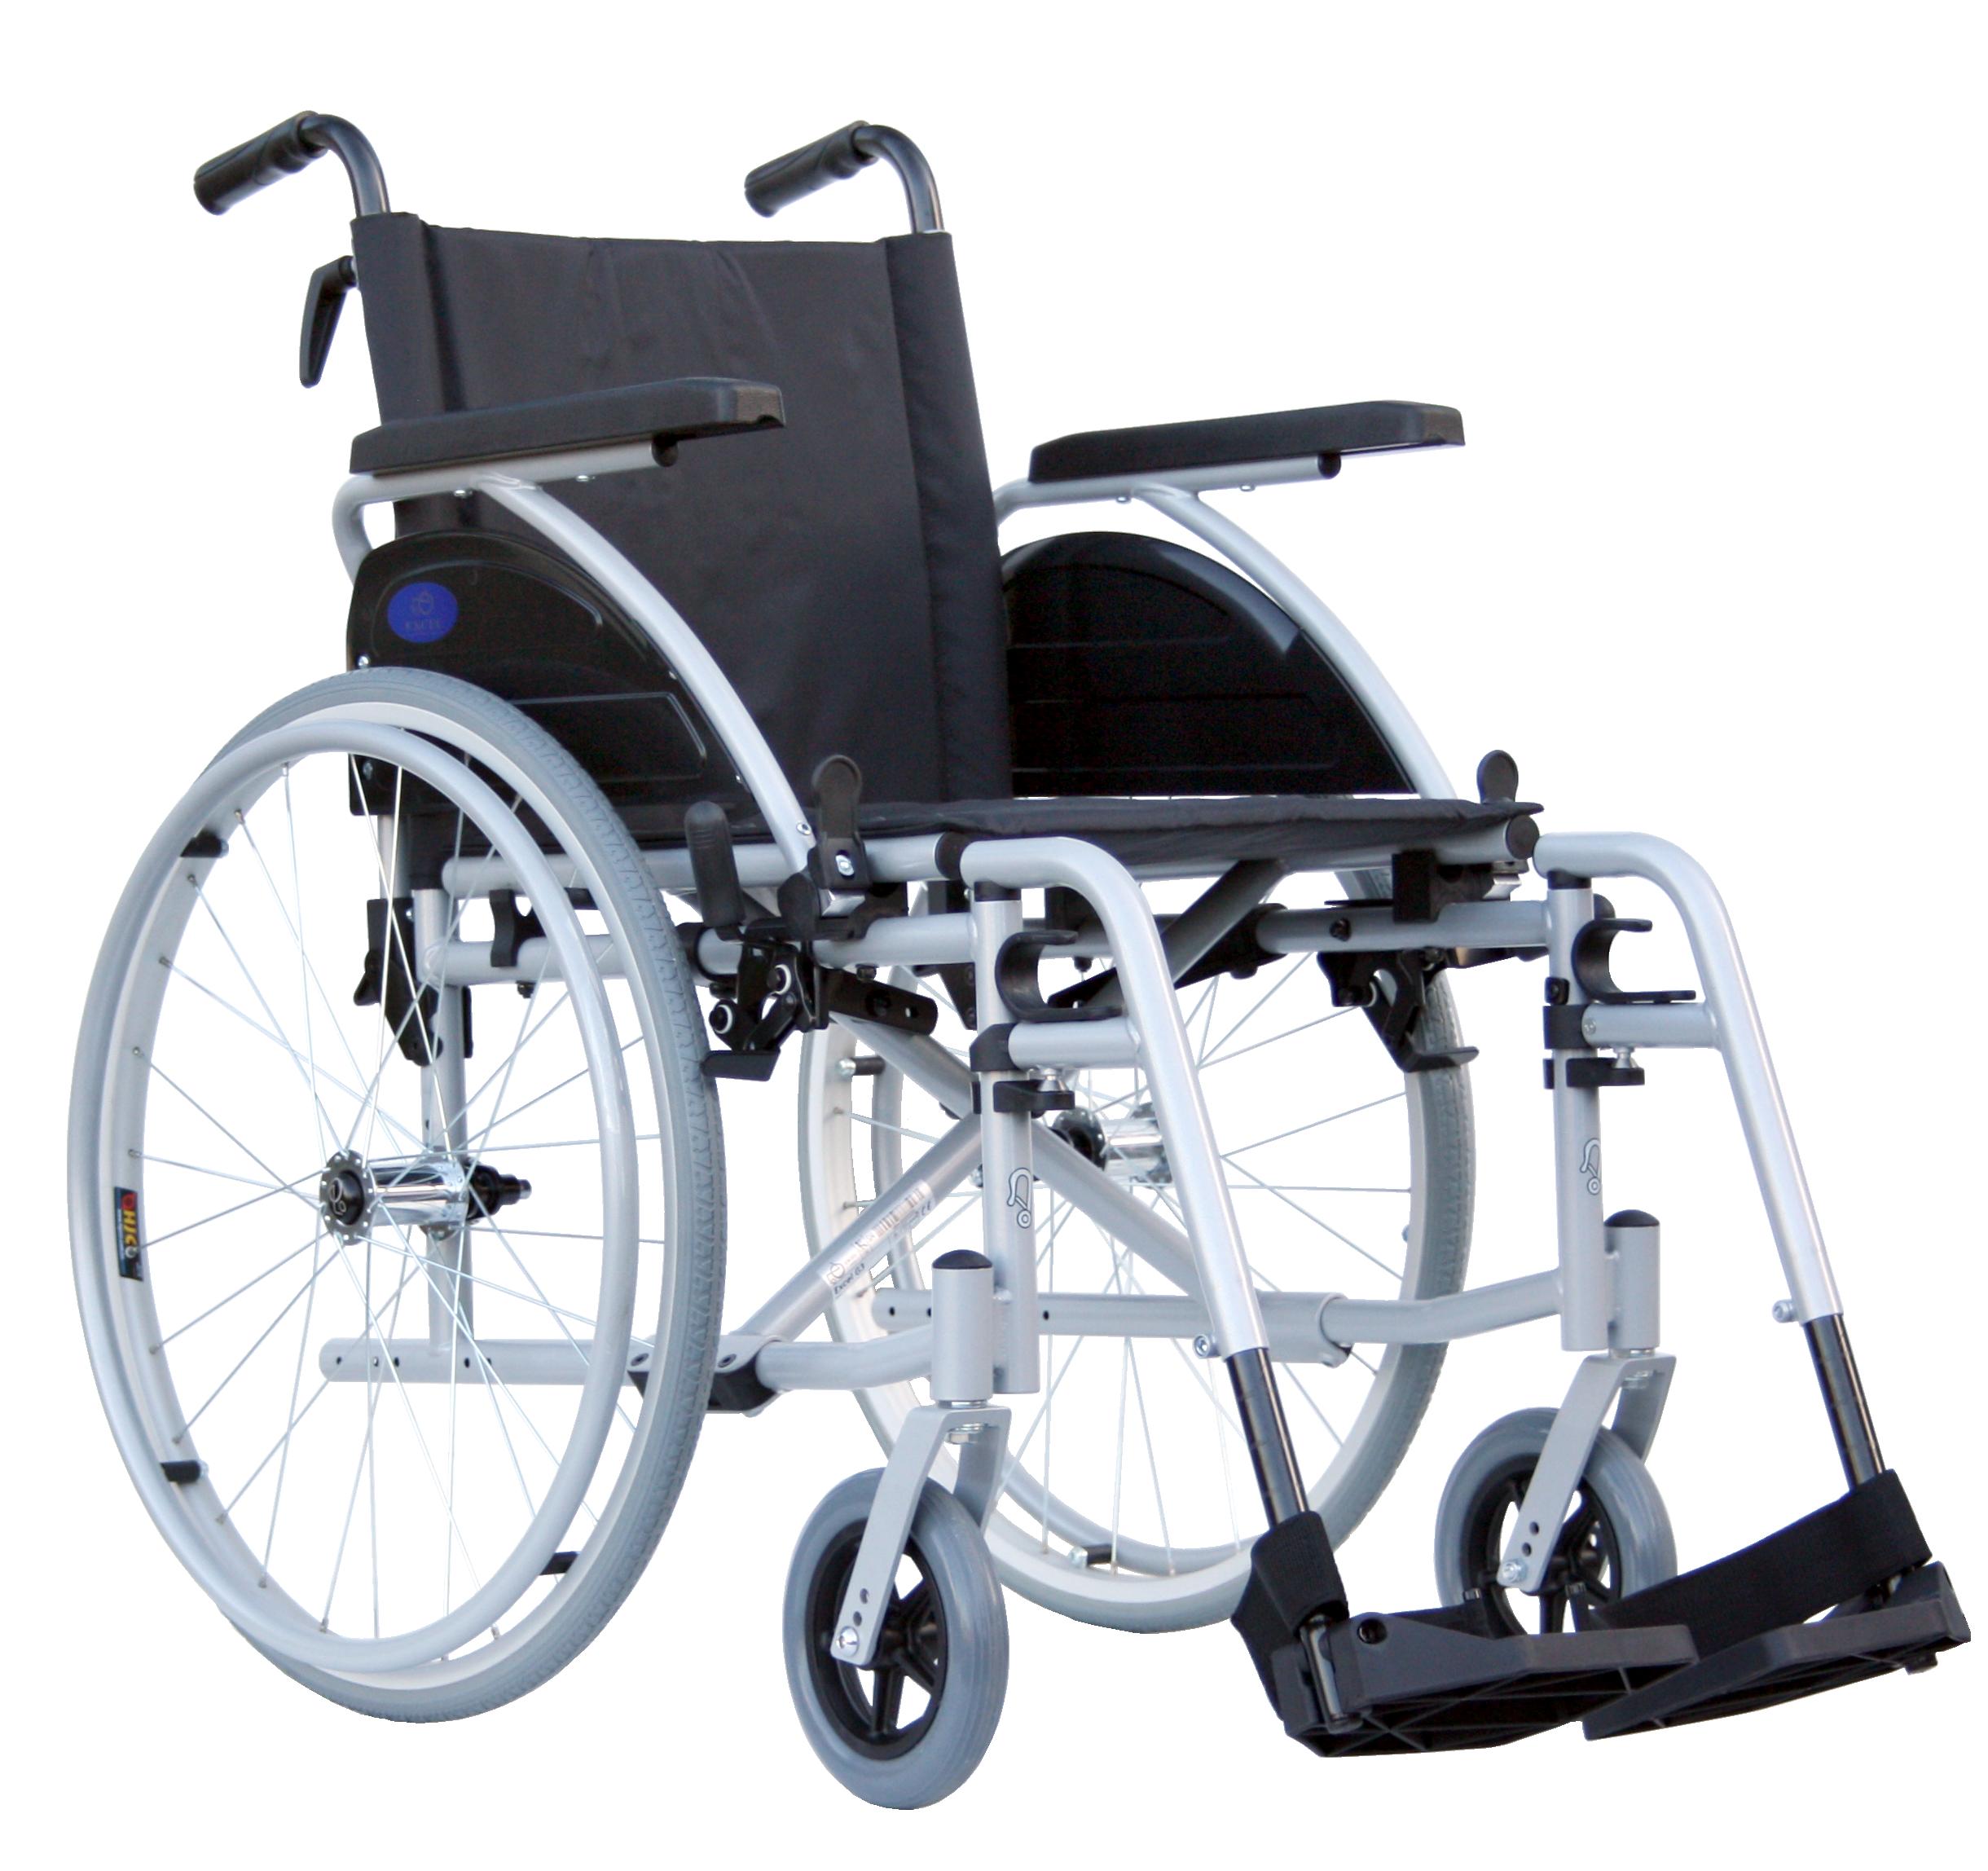 Black Wheelchair Png Image Wheelchair Black Black Wallet